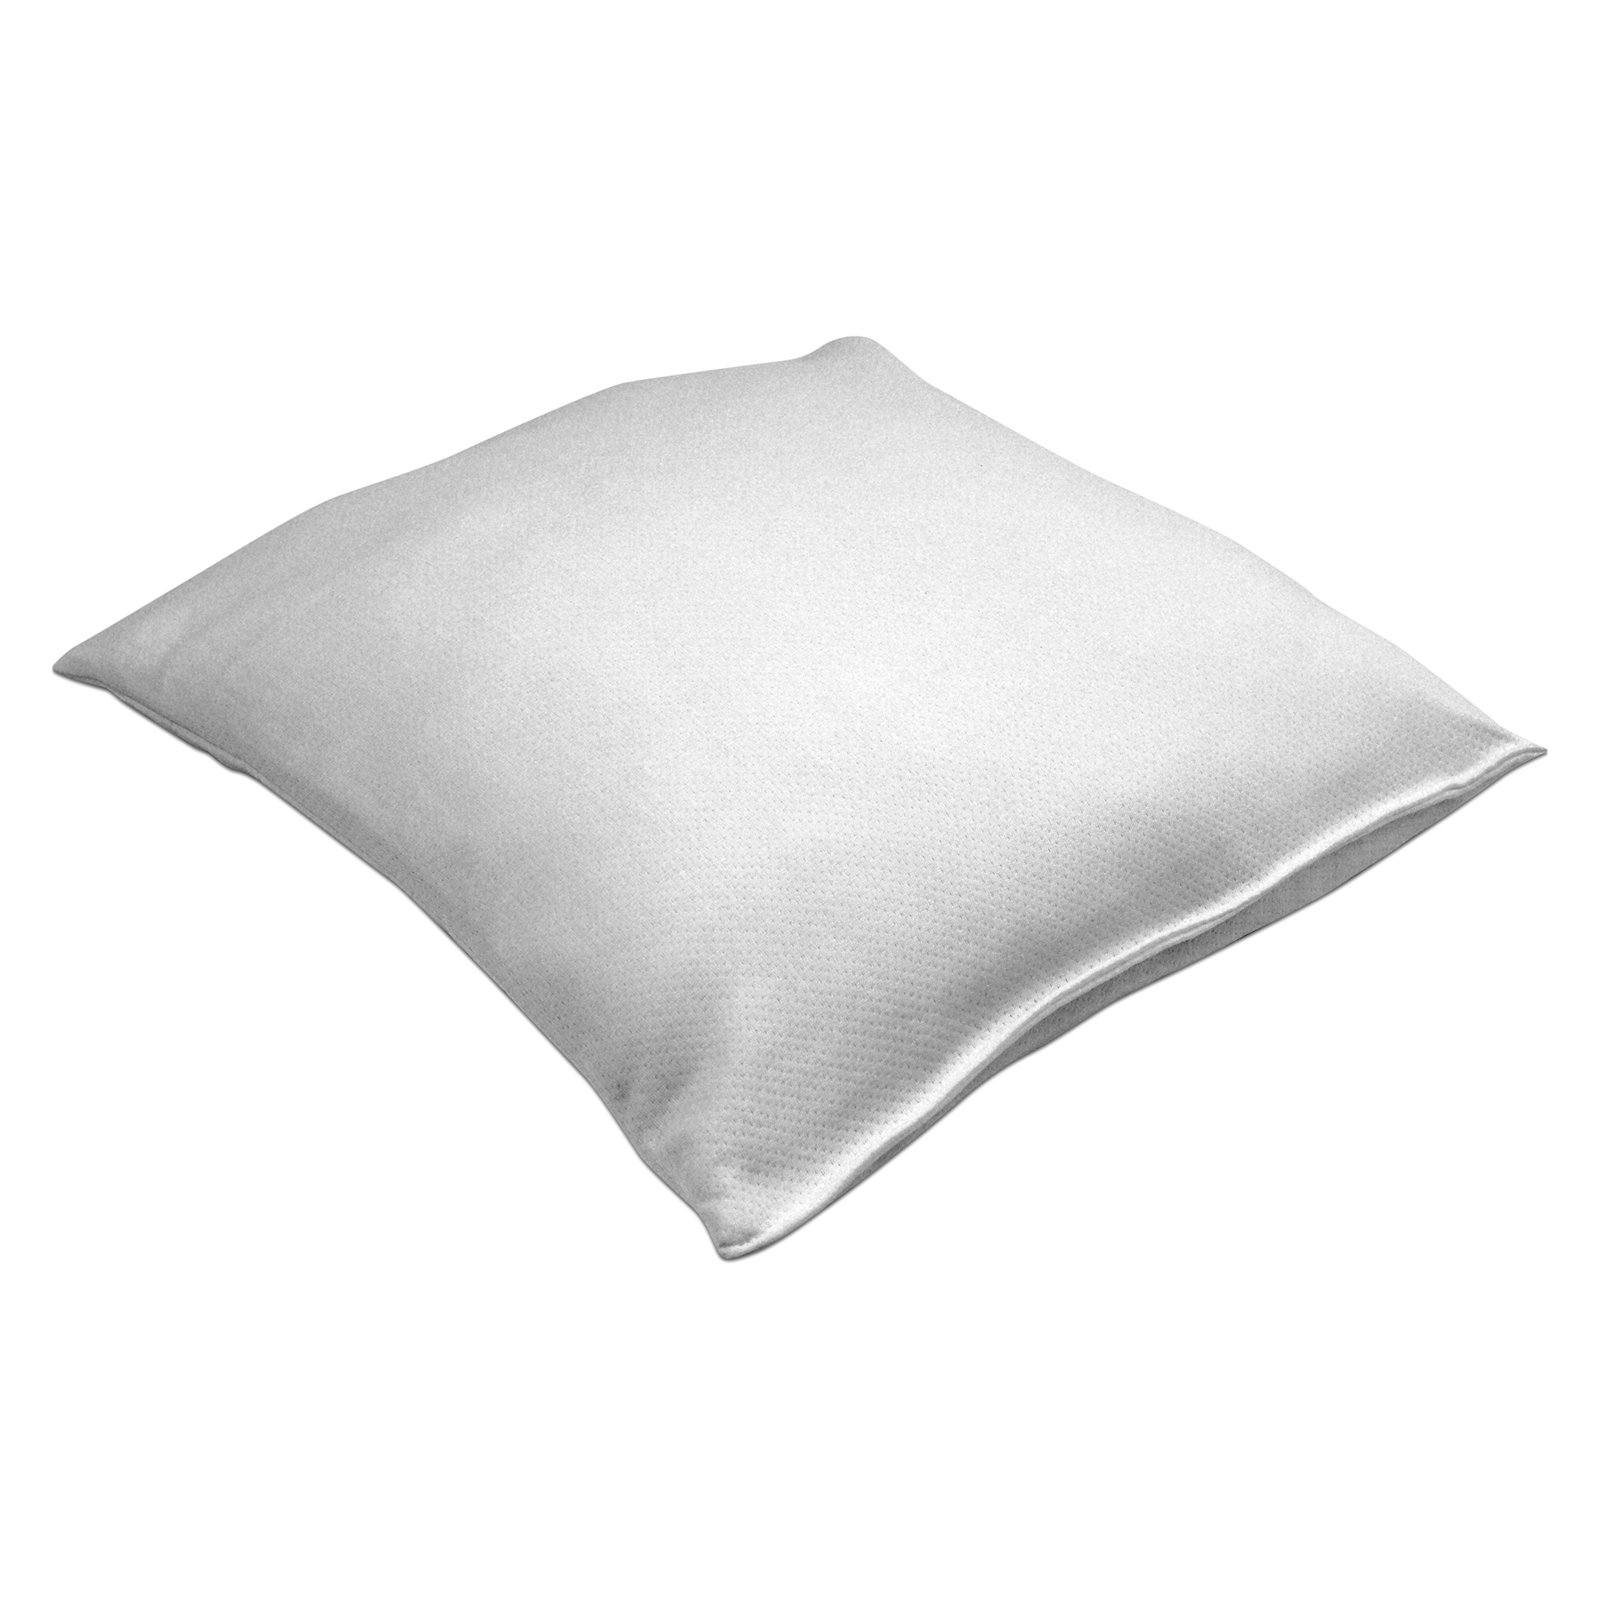 Somerset Home Memory Foam Comfort Touch Pillow